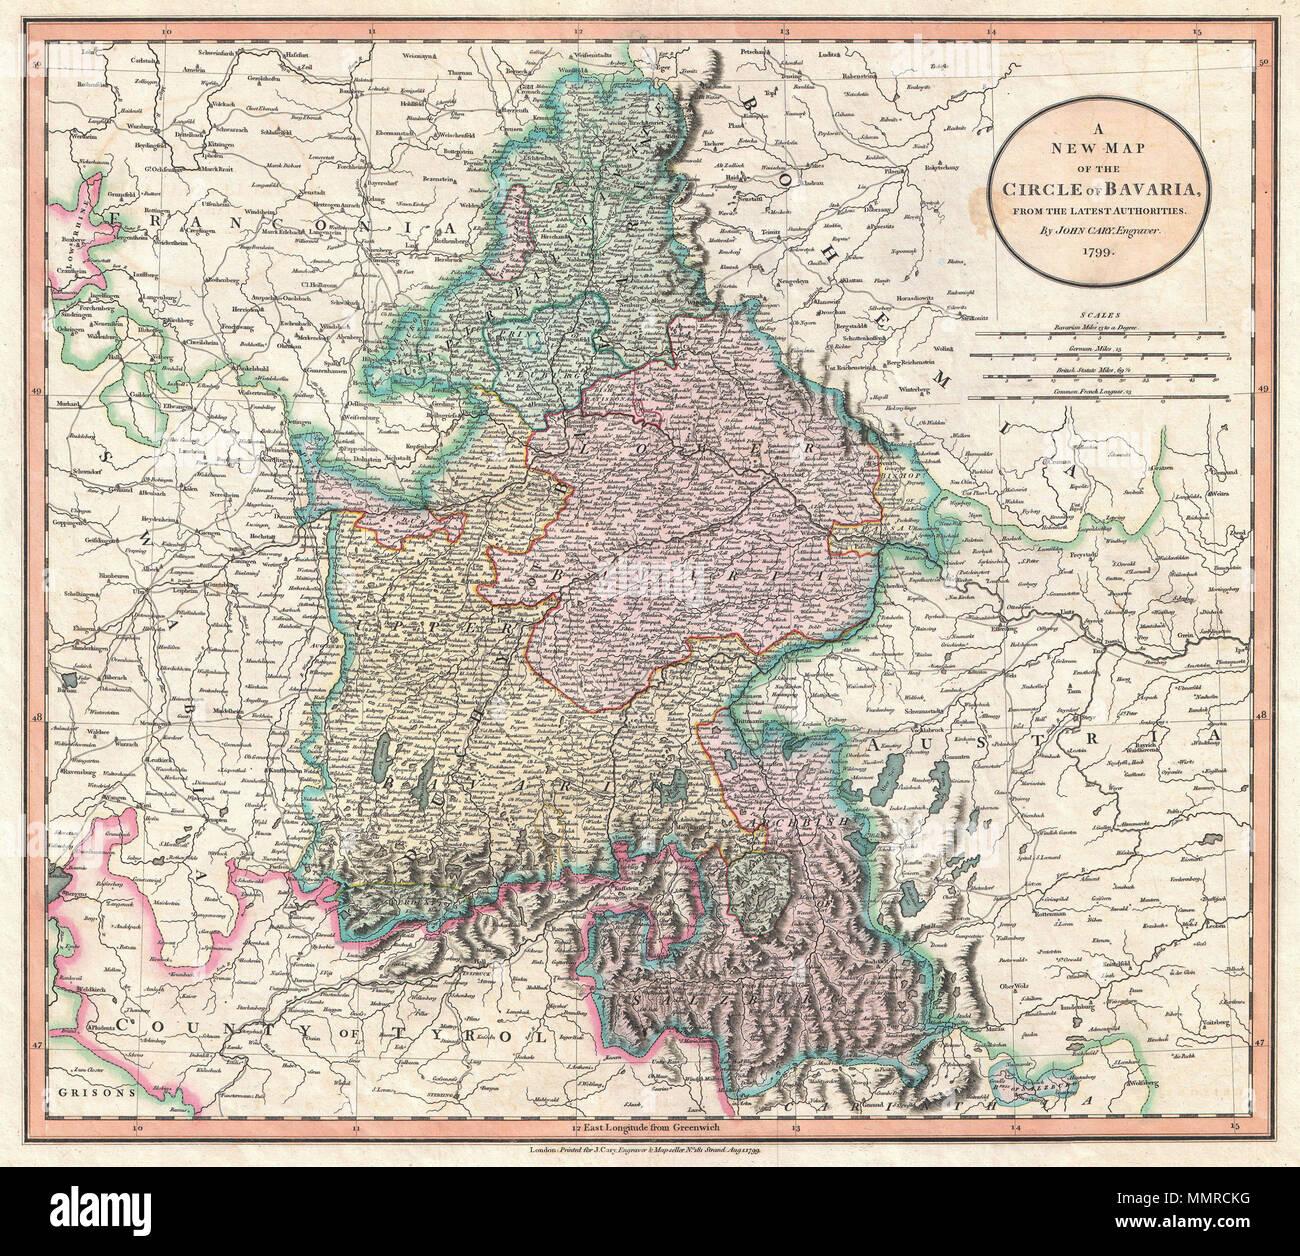 English John Cary S 1799 Map Of The Circle Of Bavaria Germany